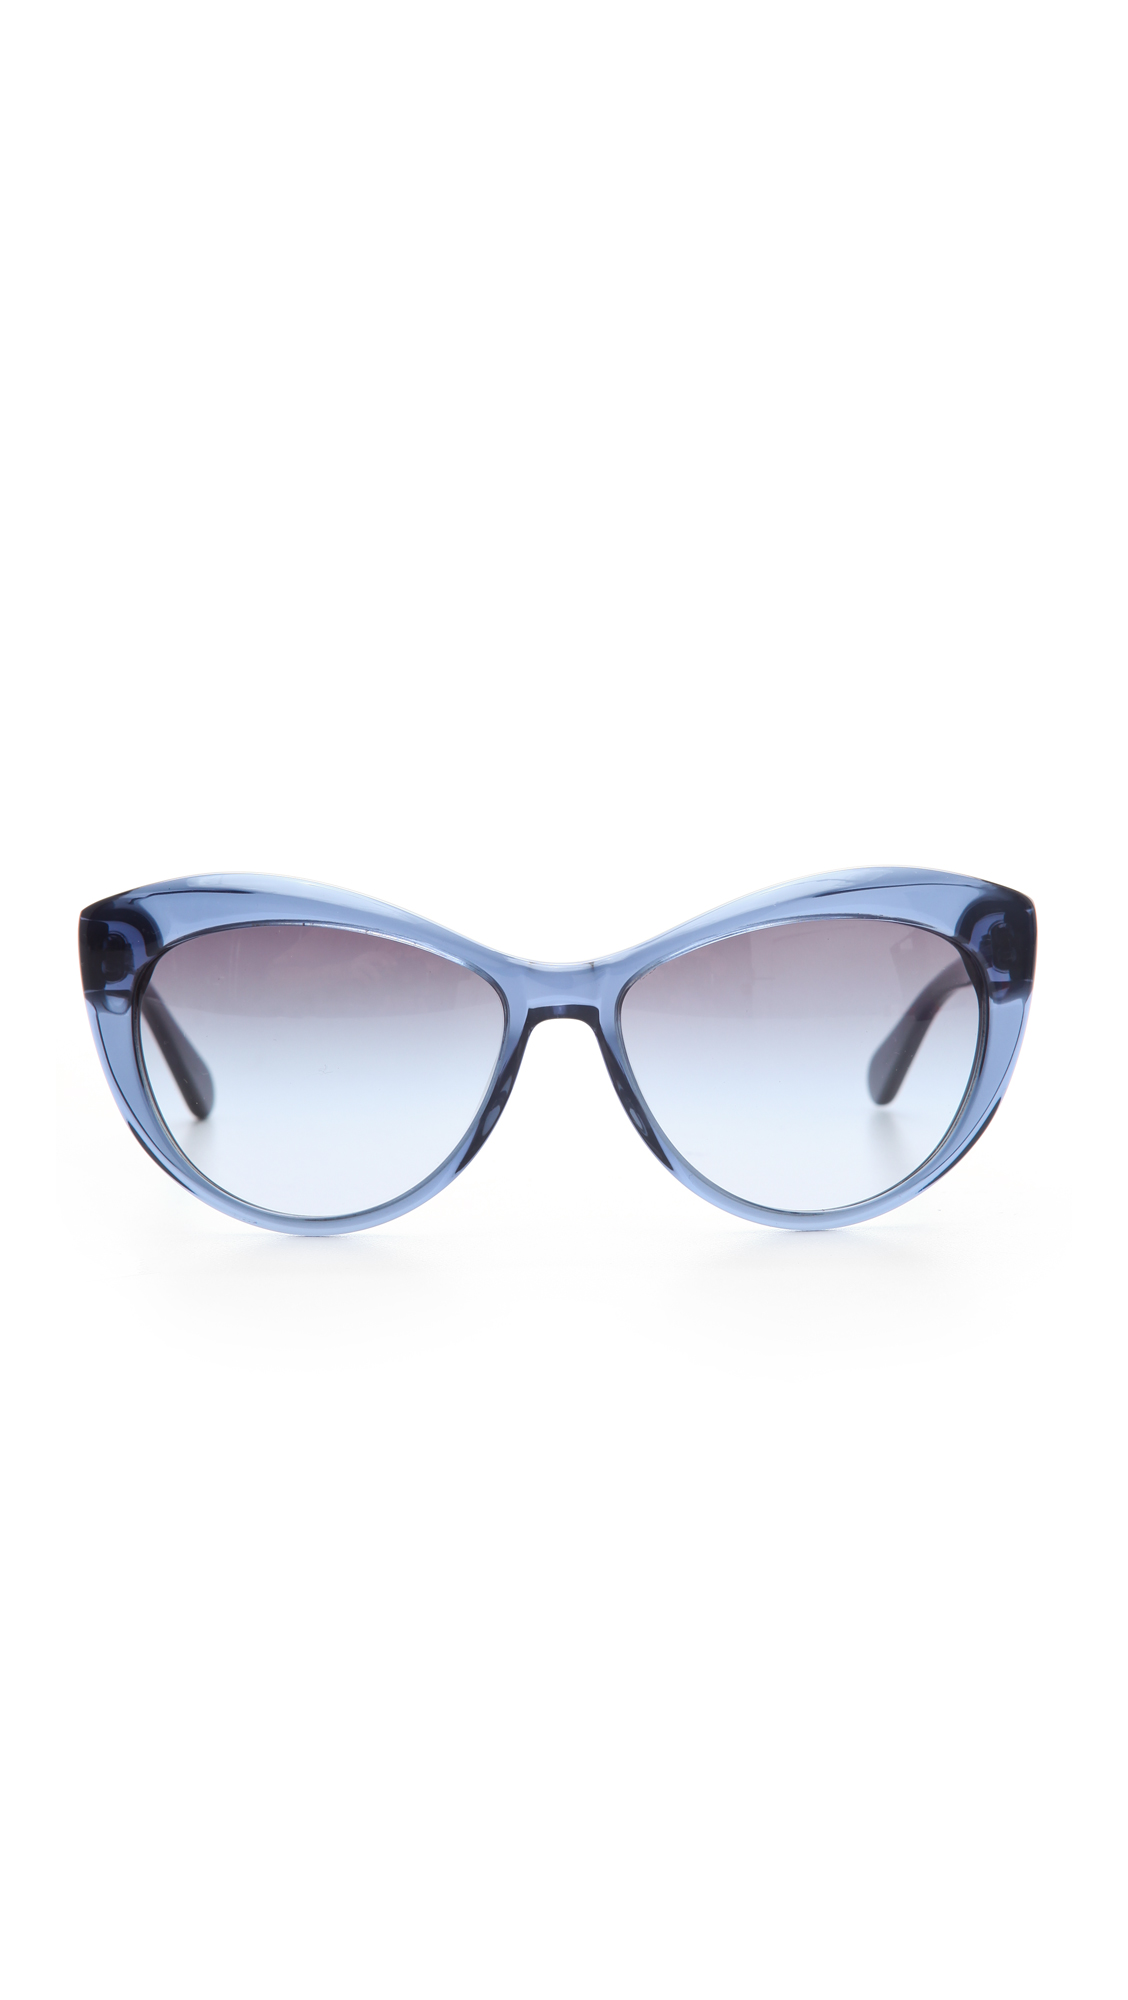 Lyst Tory Burch Oversized Cat Eye Sunglasses In Blue